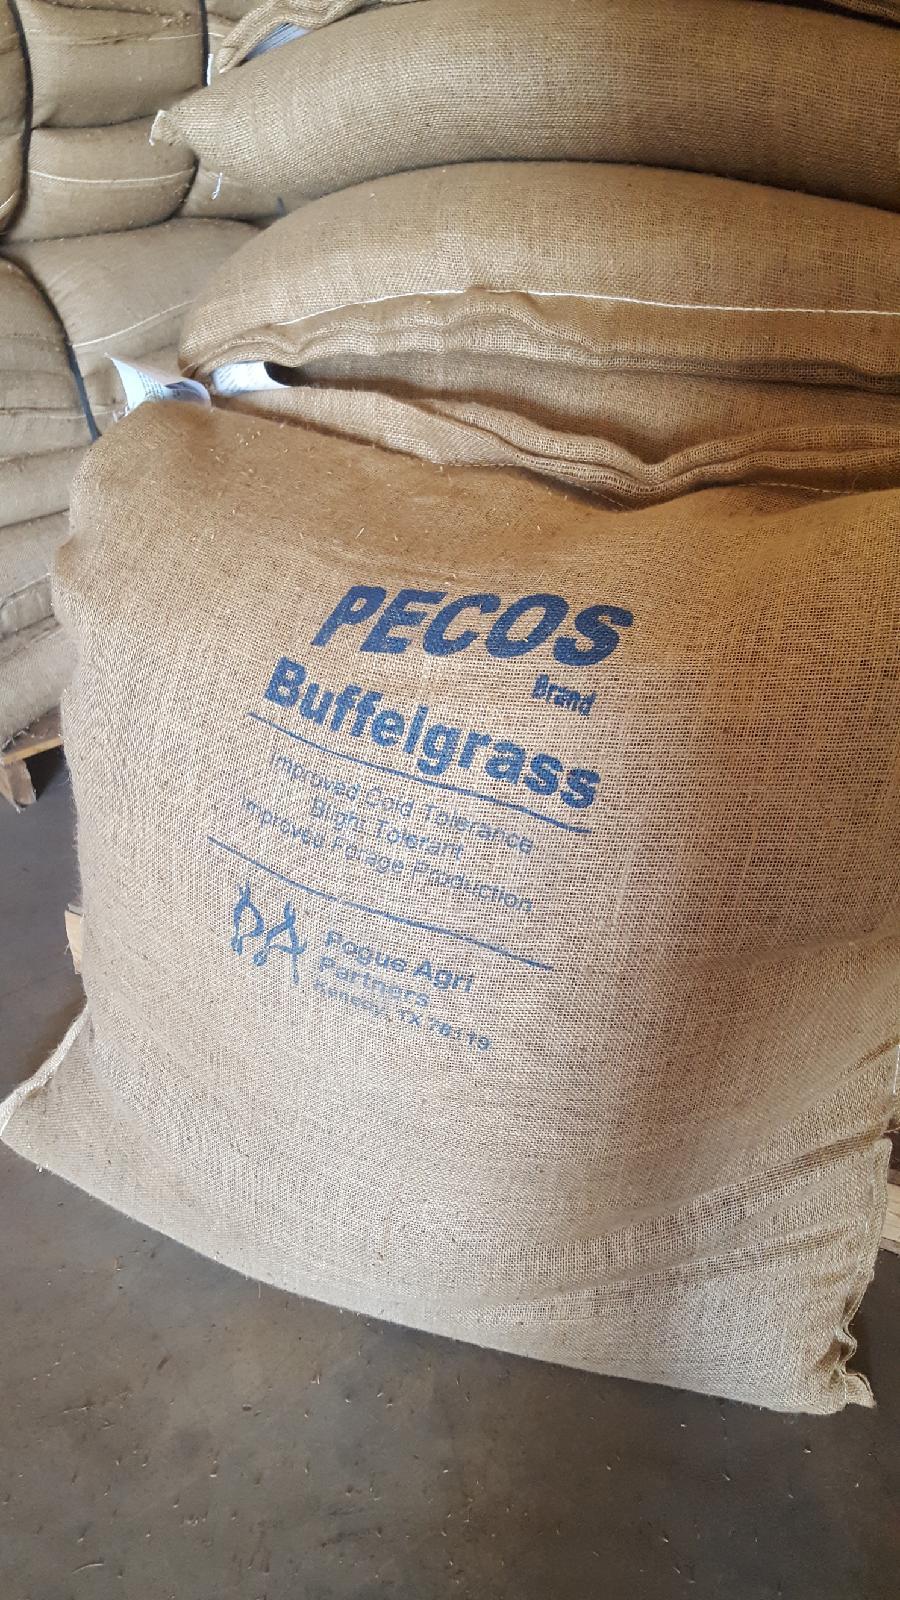 Buffel Pecos 174 Brand Buffel Grass Seed Company